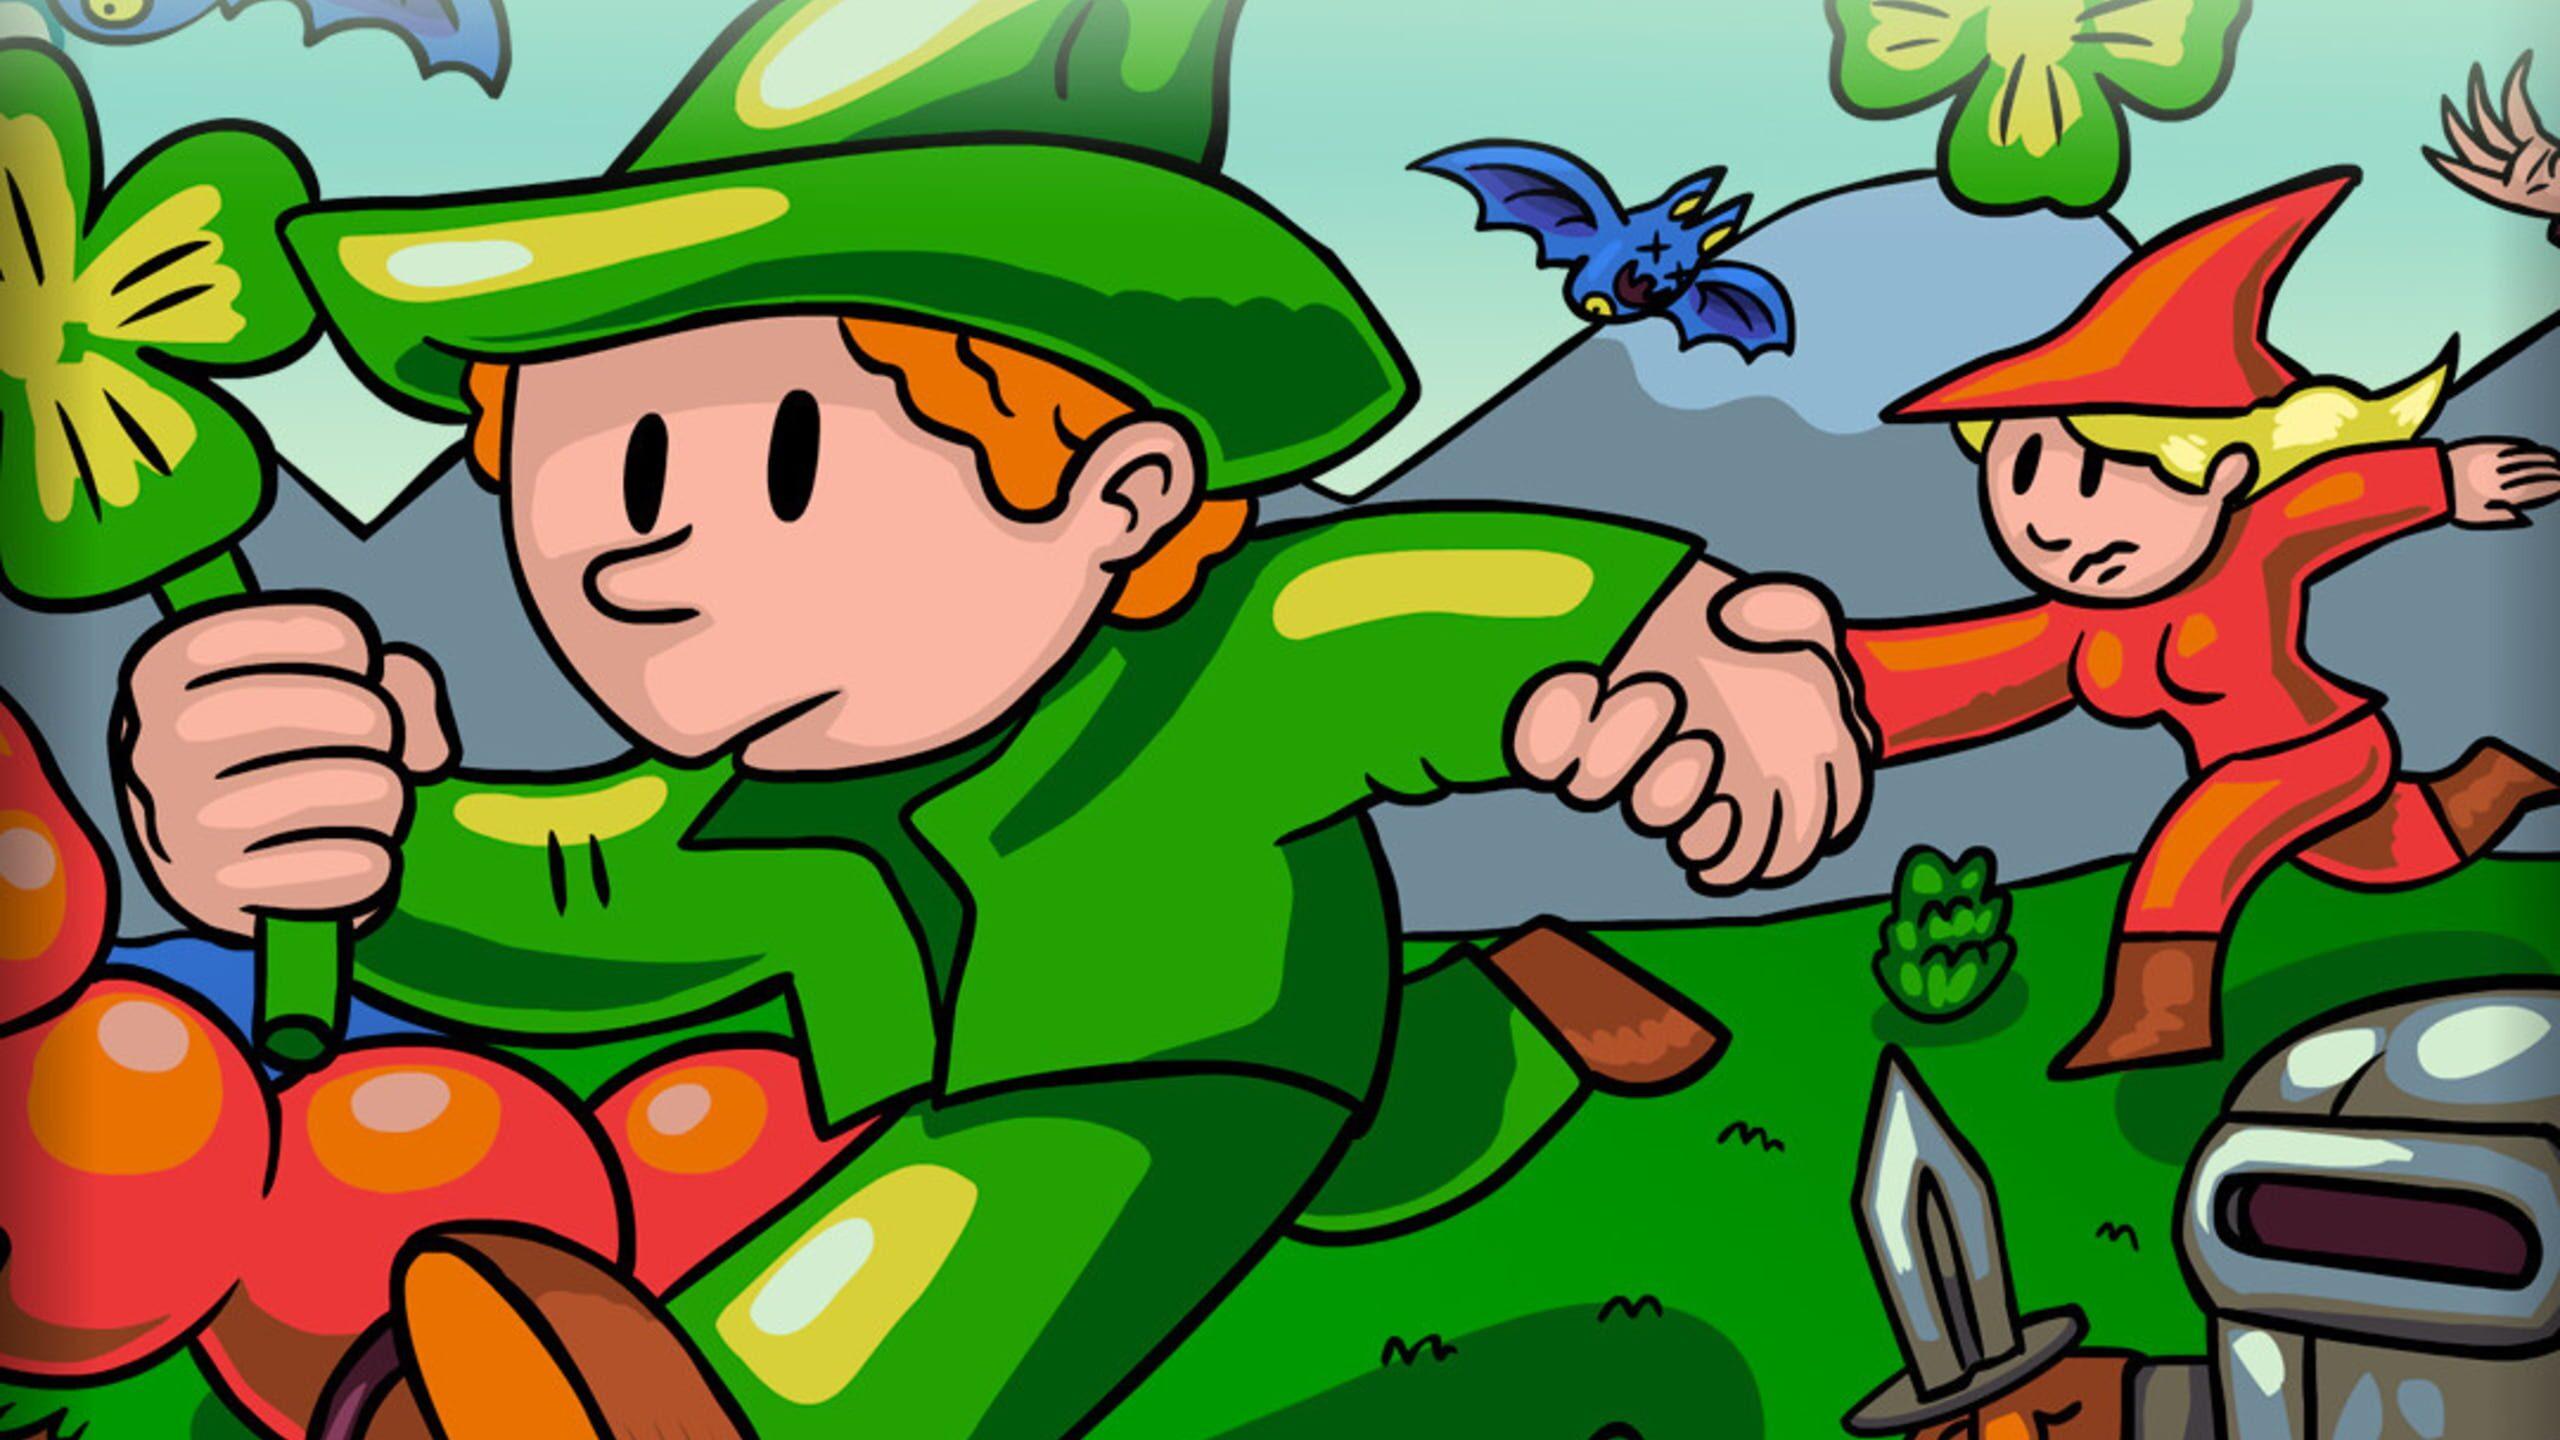 game cover art for Job the Leprechaun